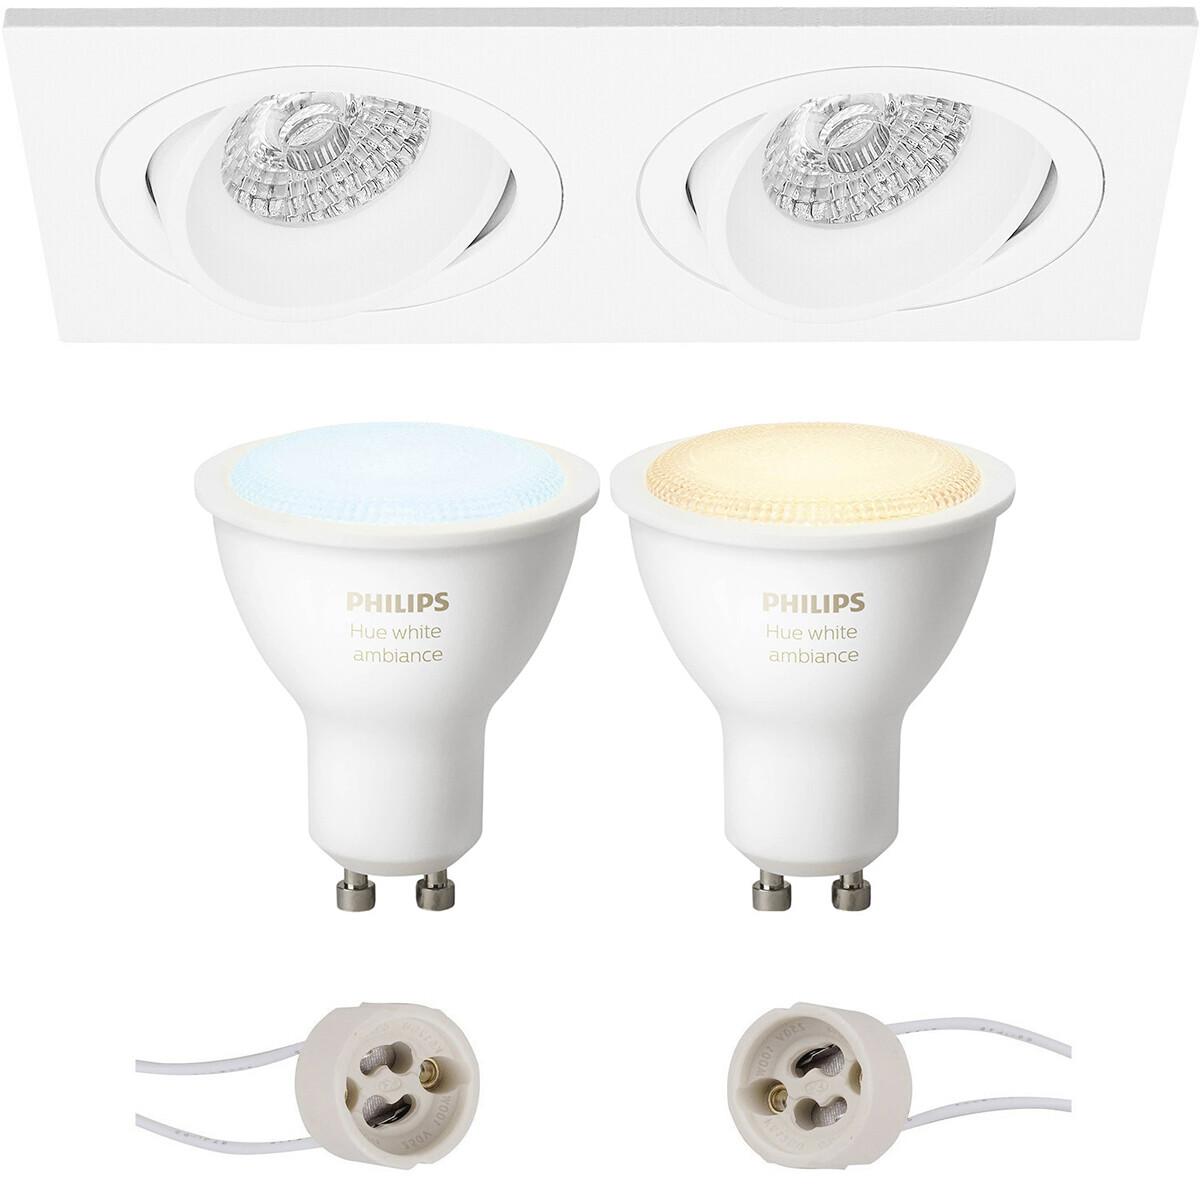 Pragmi Borny Pro - Inbouw Rechthoek Dubbel - Mat Wit - Kantelbaar - 175x92mm - Philips Hue - LED Spo